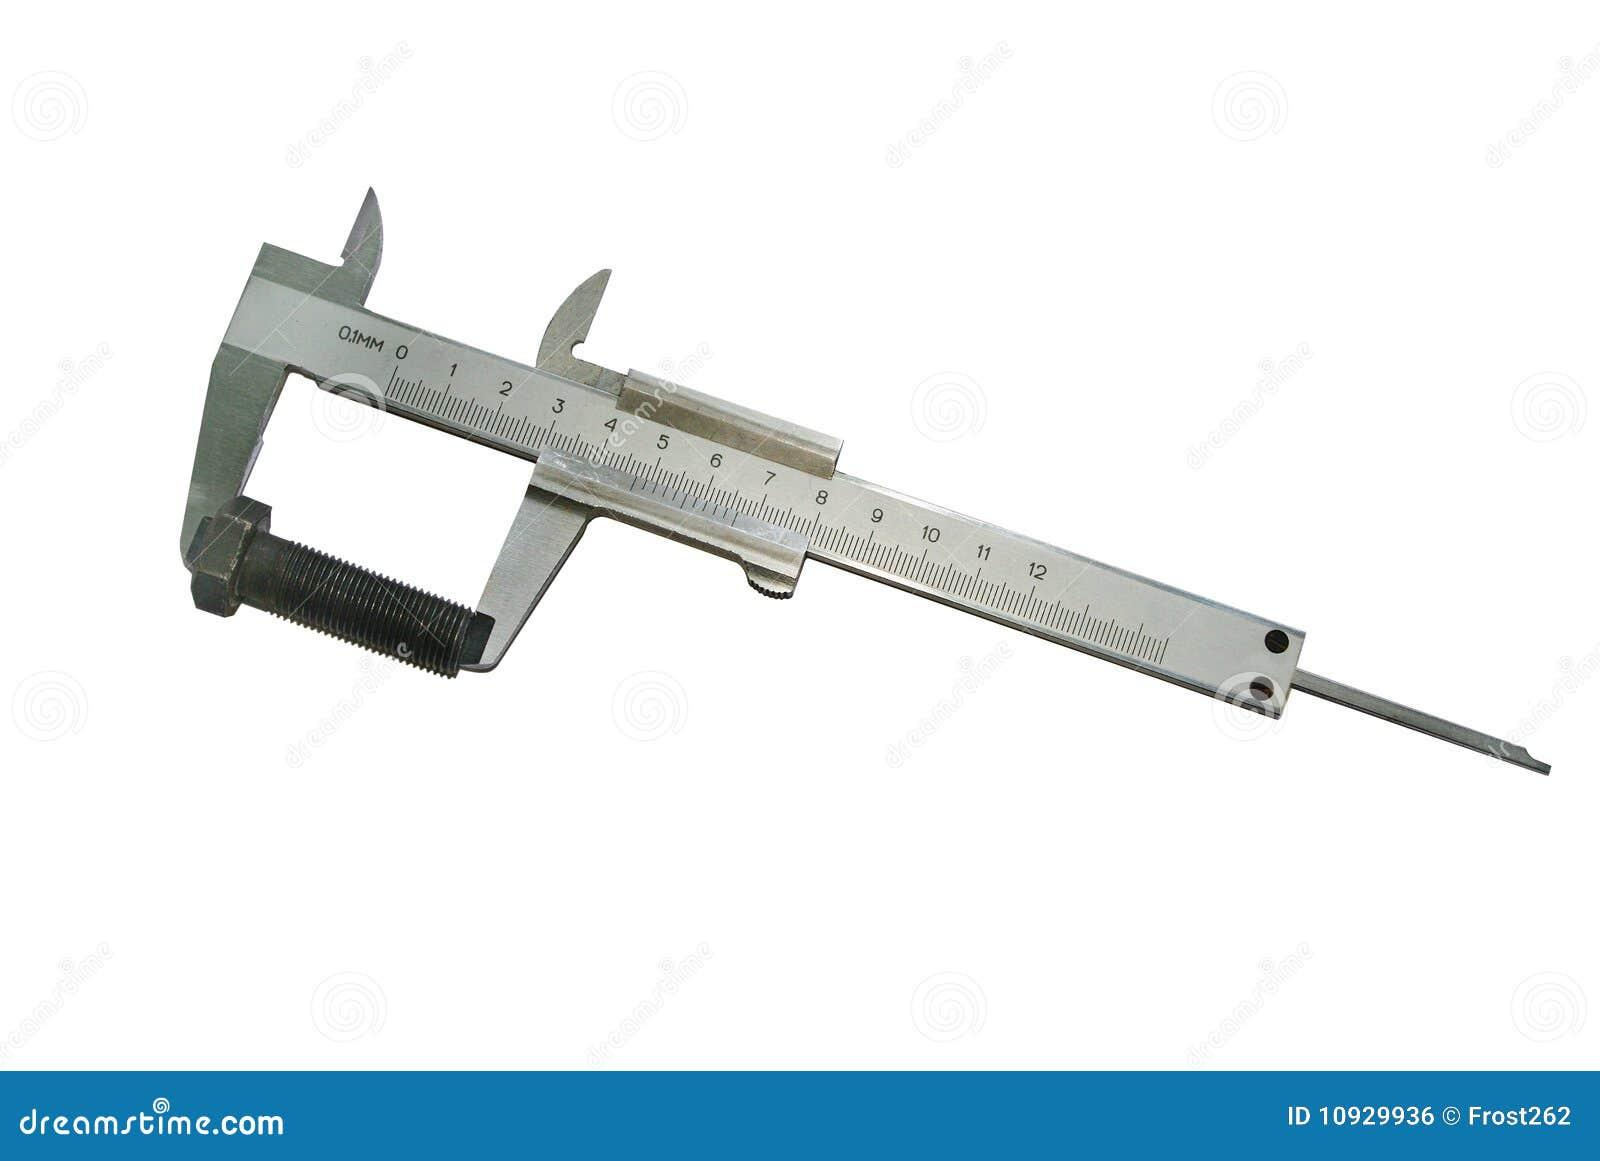 инструменты аппаратуры измеряя